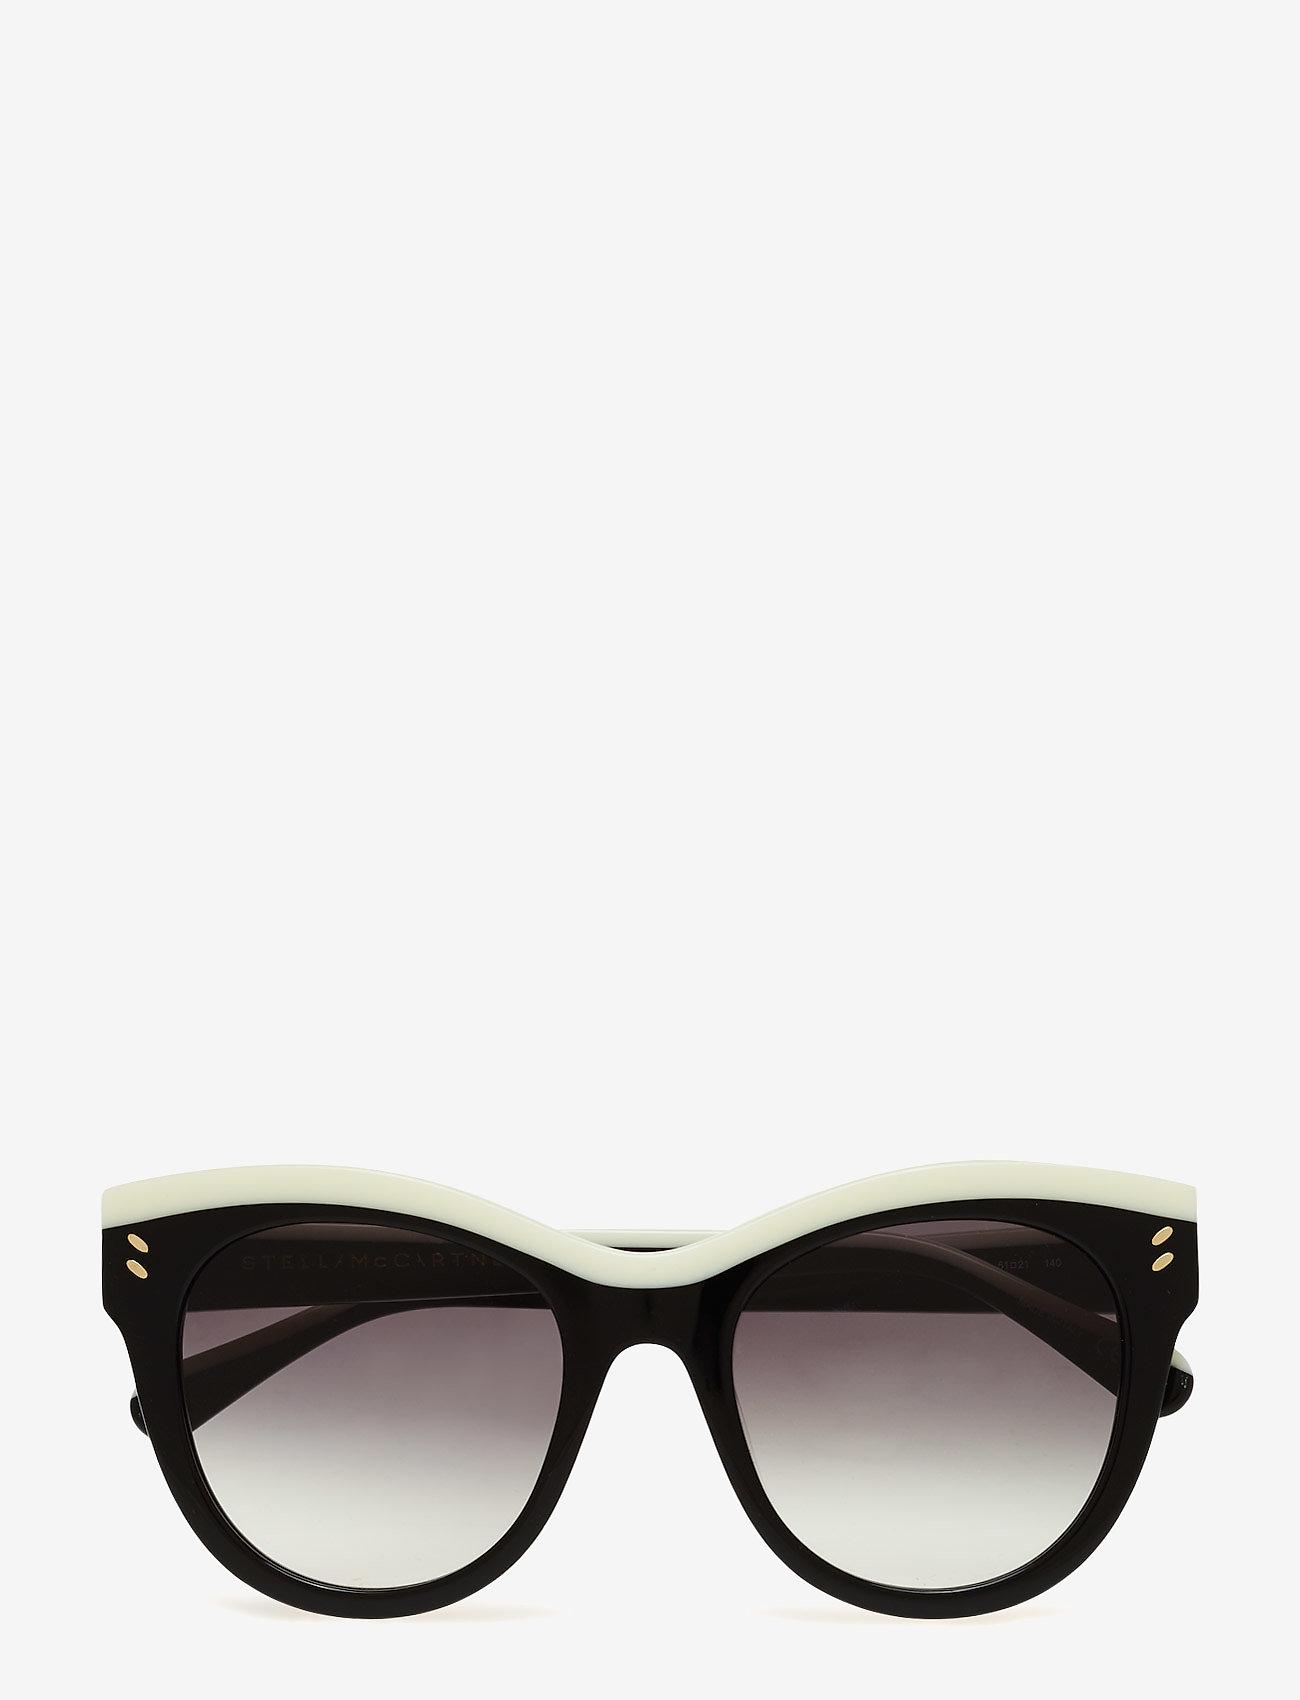 Stella McCartney Eyewear - SC0021S - cat-eye - black-black-grey - 1